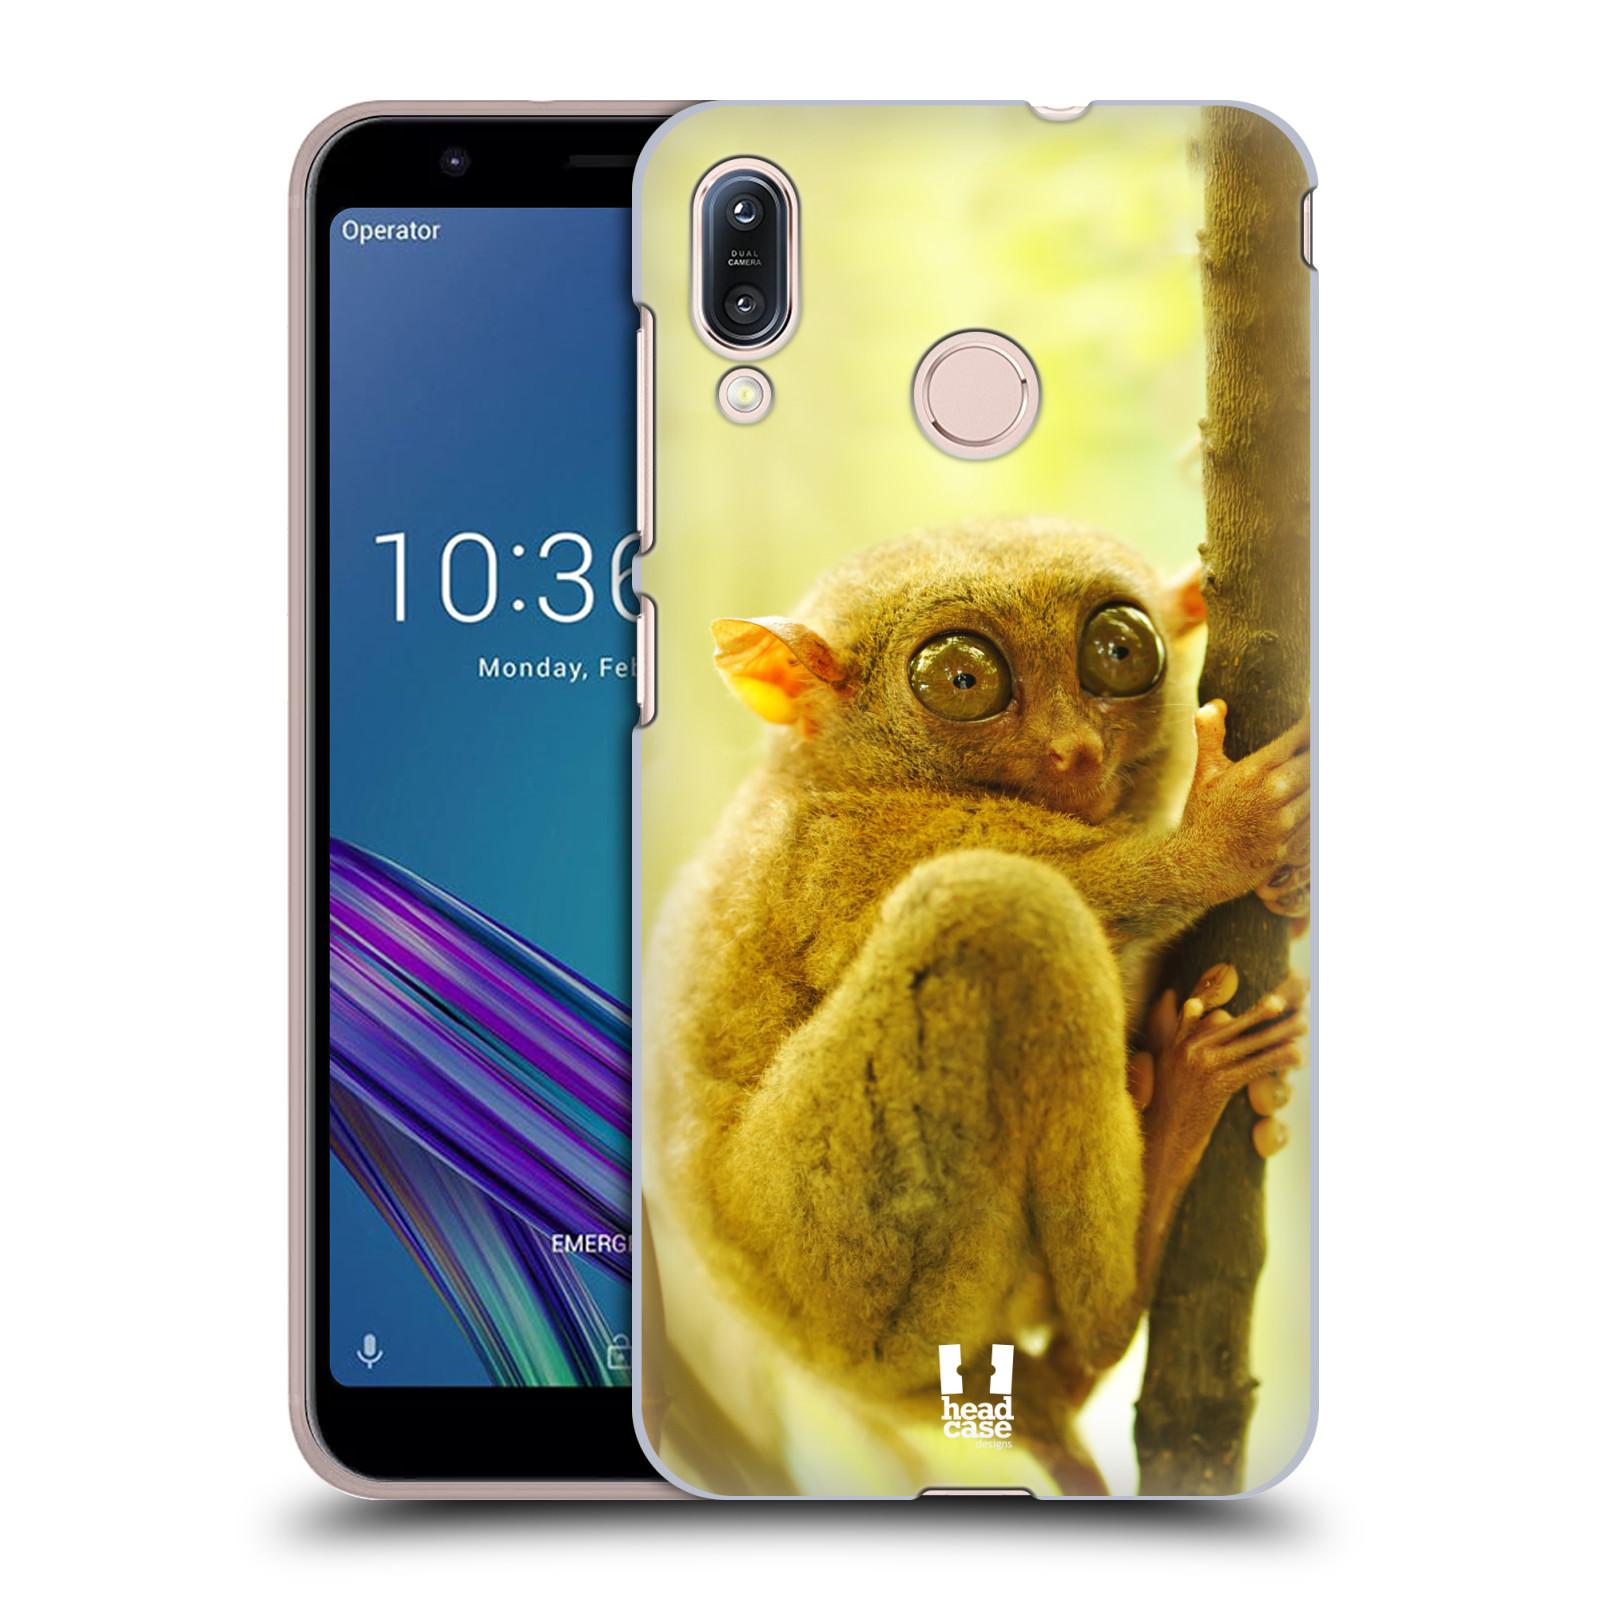 Pouzdro na mobil Asus Zenfone Max M1 (ZB555KL) - HEAD CASE - vzor slavná zvířata foto Nártoun